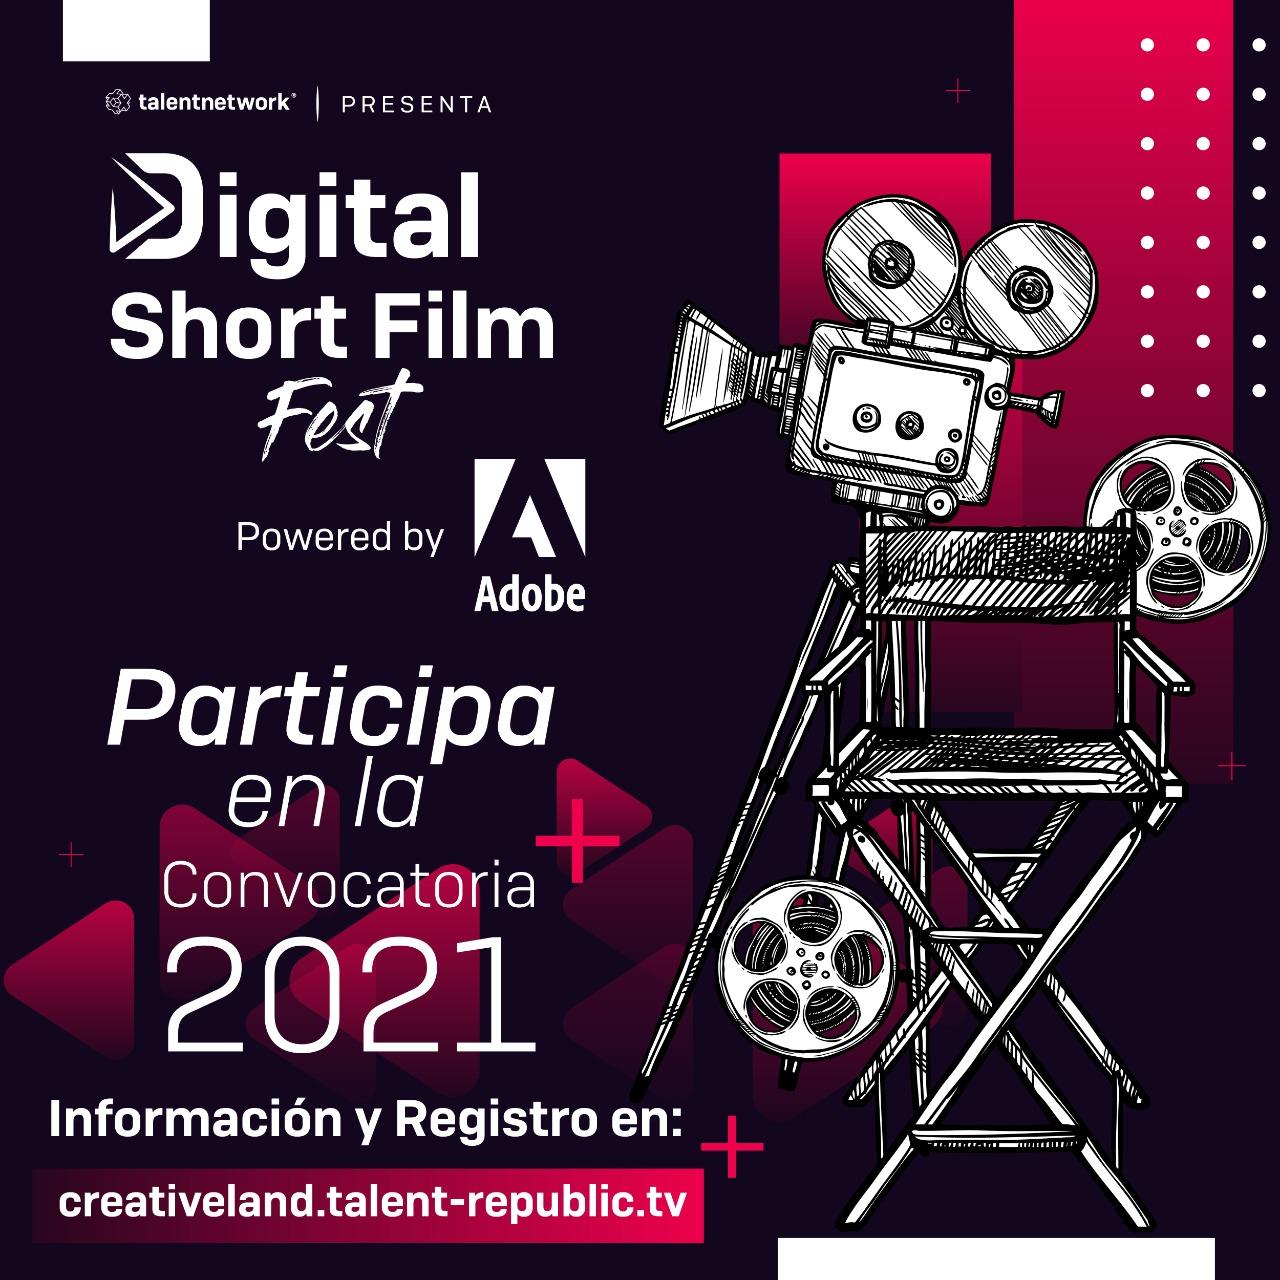 Digital Short Film Fest 2021: ¡Aun tienes oportunidad de participar! 2